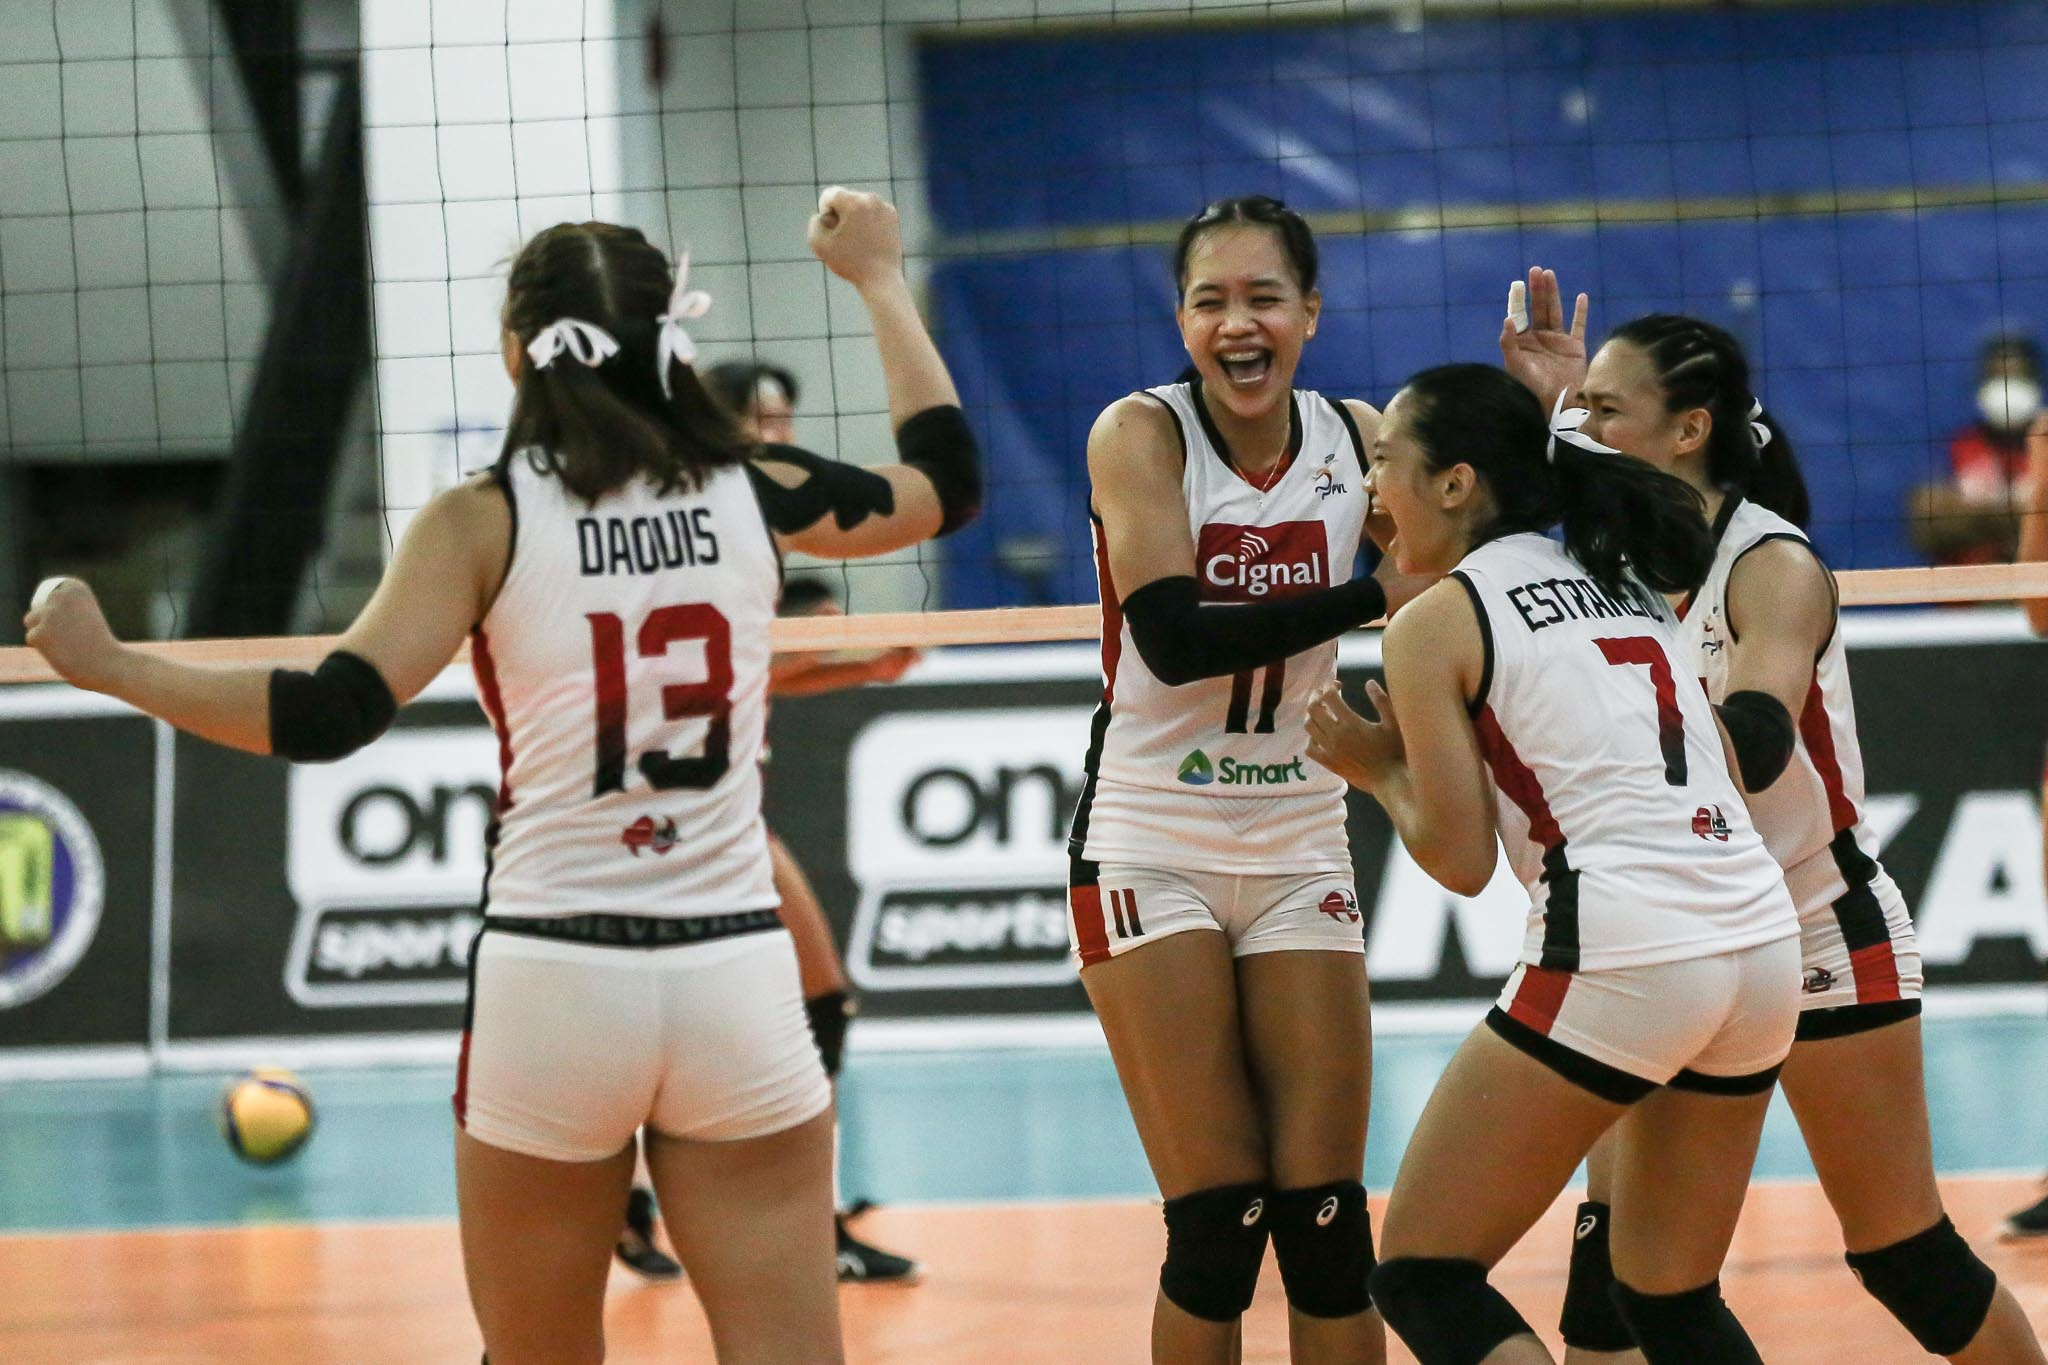 2021-PVL-Open-Cignal-vs-Chery-Tiggo-Cignal-2 Shaq delos Santos bares long lay-off, short camp affected Cignal's play News PVL Volleyball  - philippine sports news